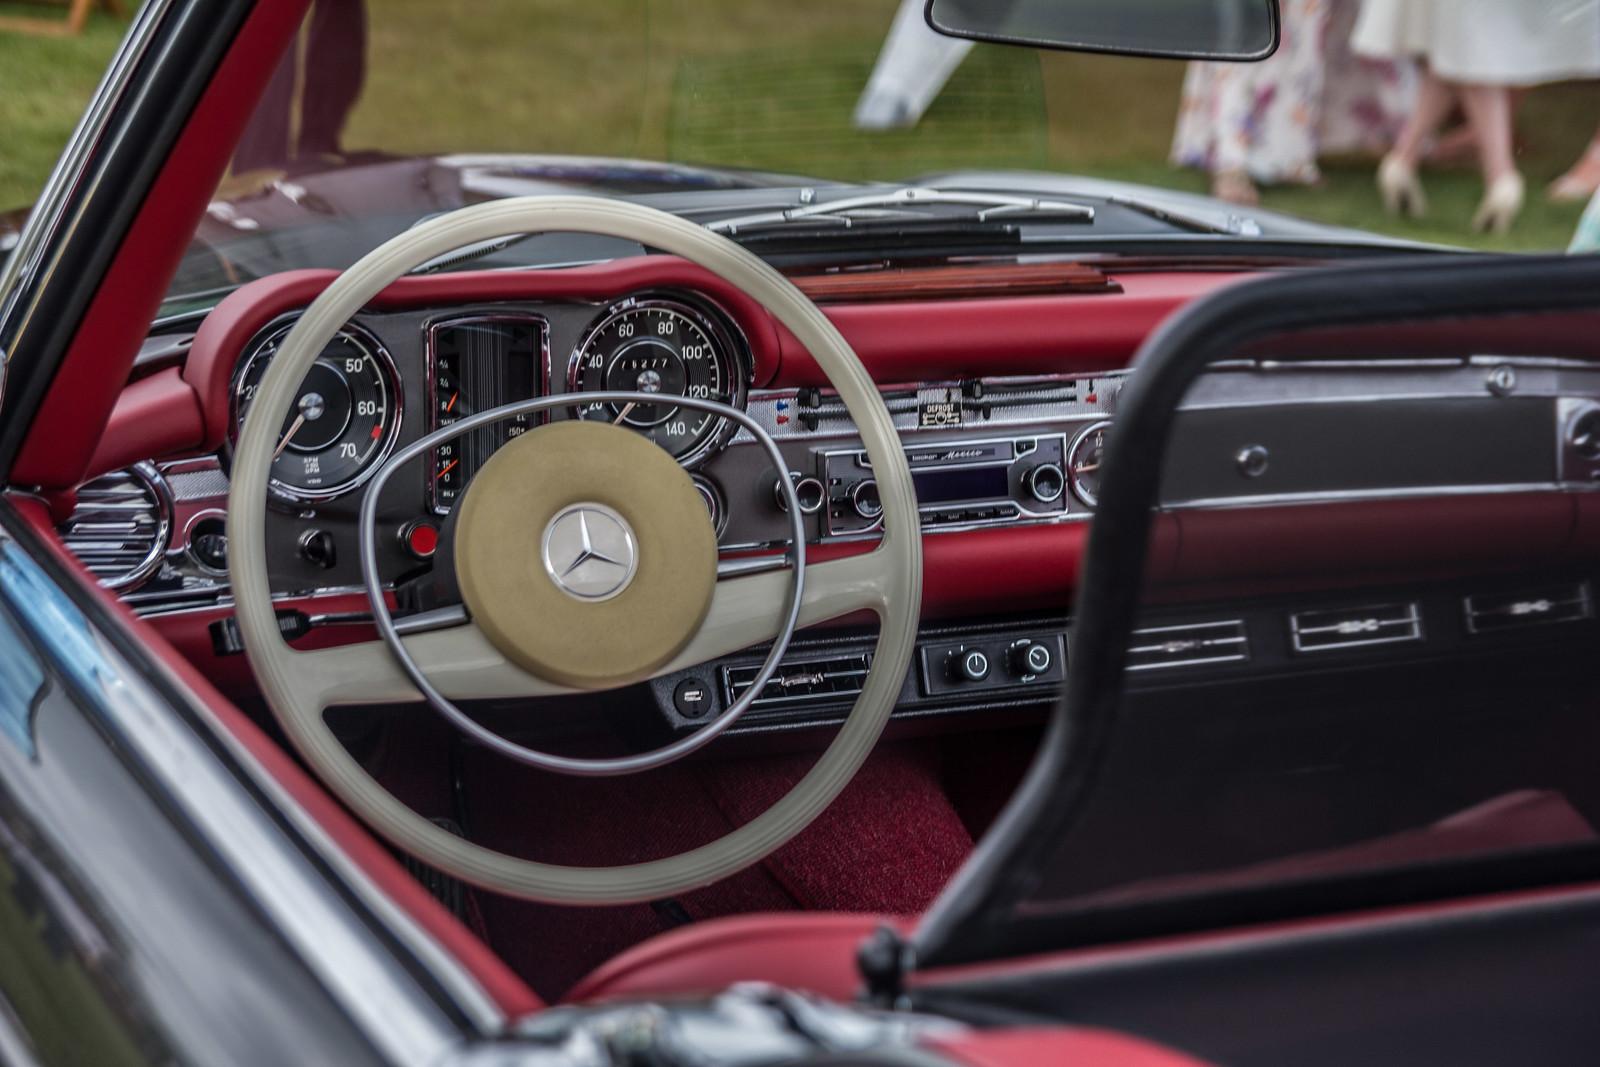 280SL classic mercede sinterior